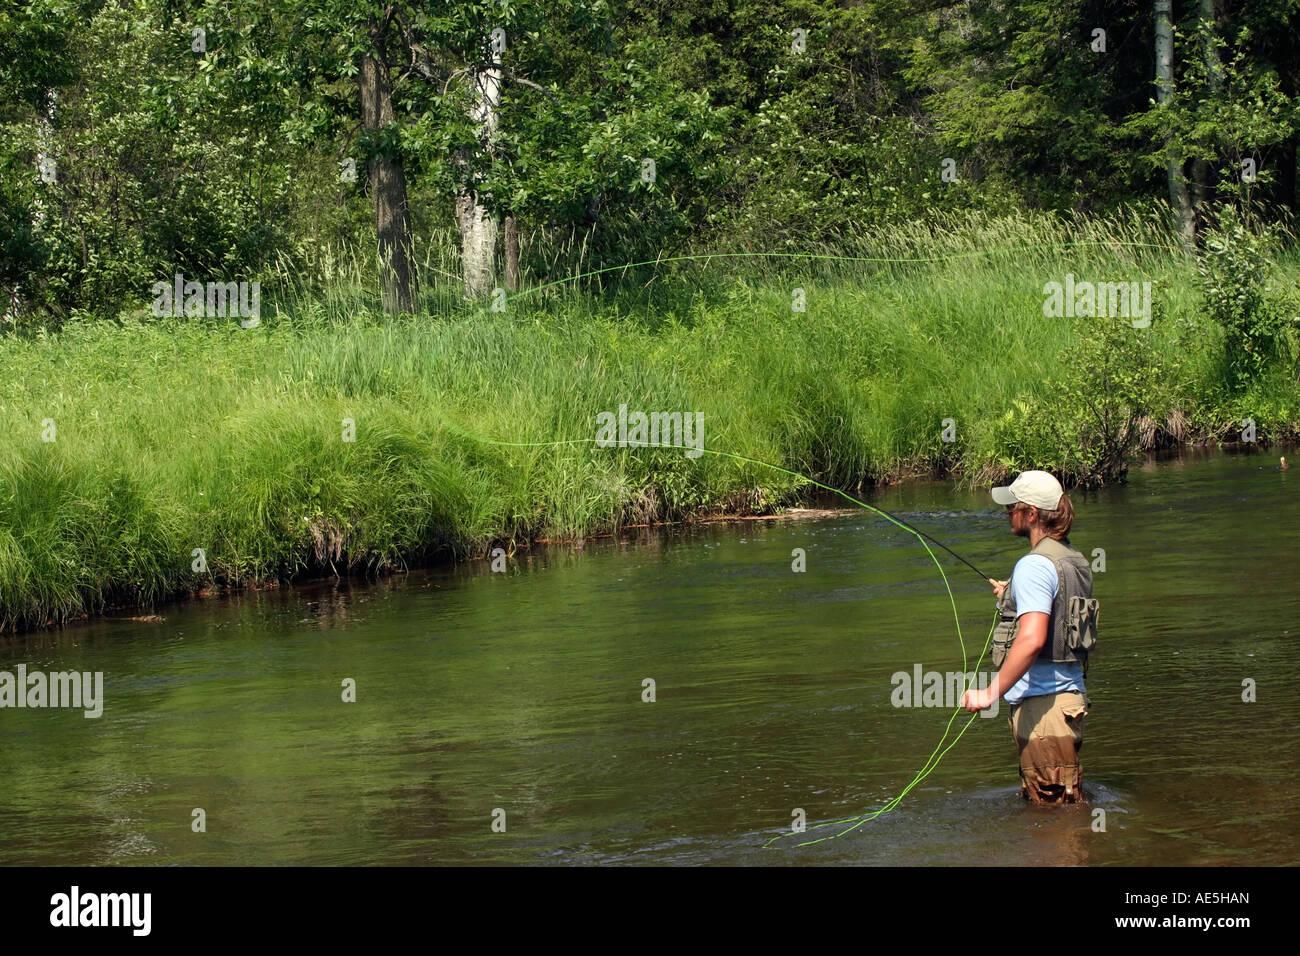 Fisherman flyfishing on Little Manistee River in Michigan